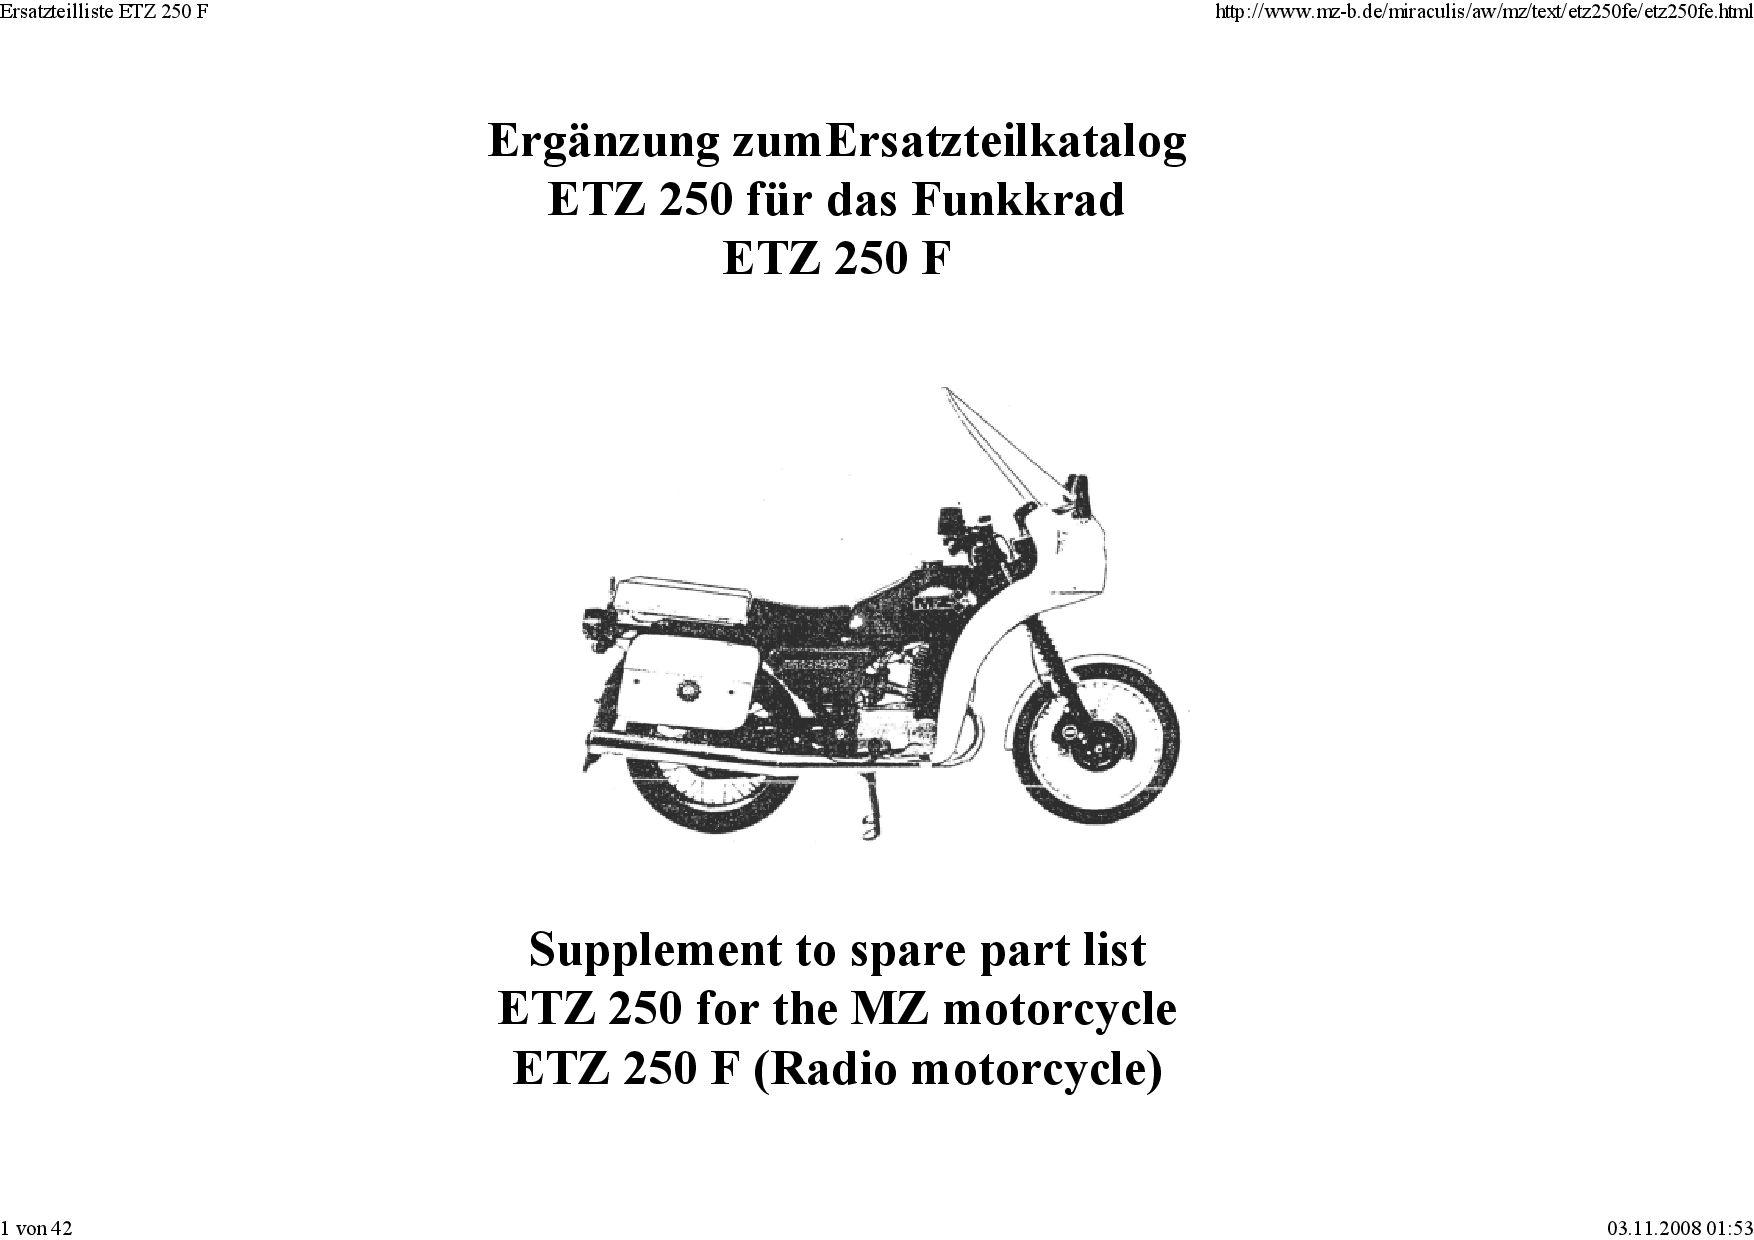 Mz Etz 250 F 1990 Parts List Pdf Download Service Manual Repair Manual Pdf Download Repair Manuals Pdf Download Windows Versions